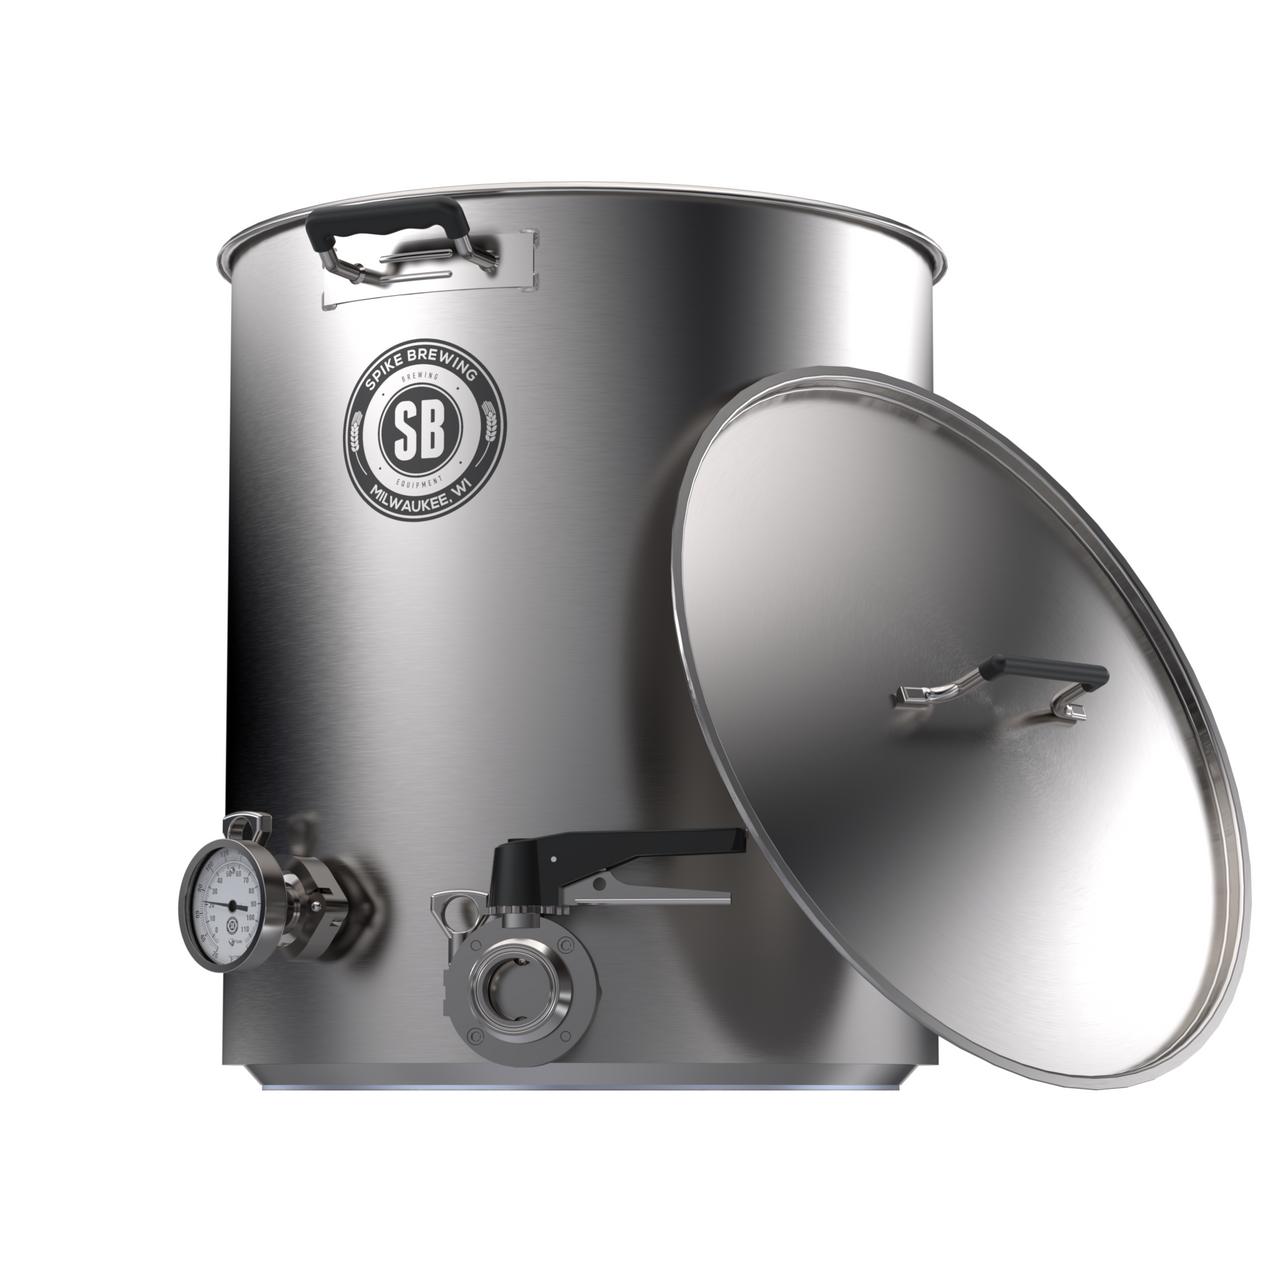 Spike V4 - 15 Gallon Spike+ Brew Kettle